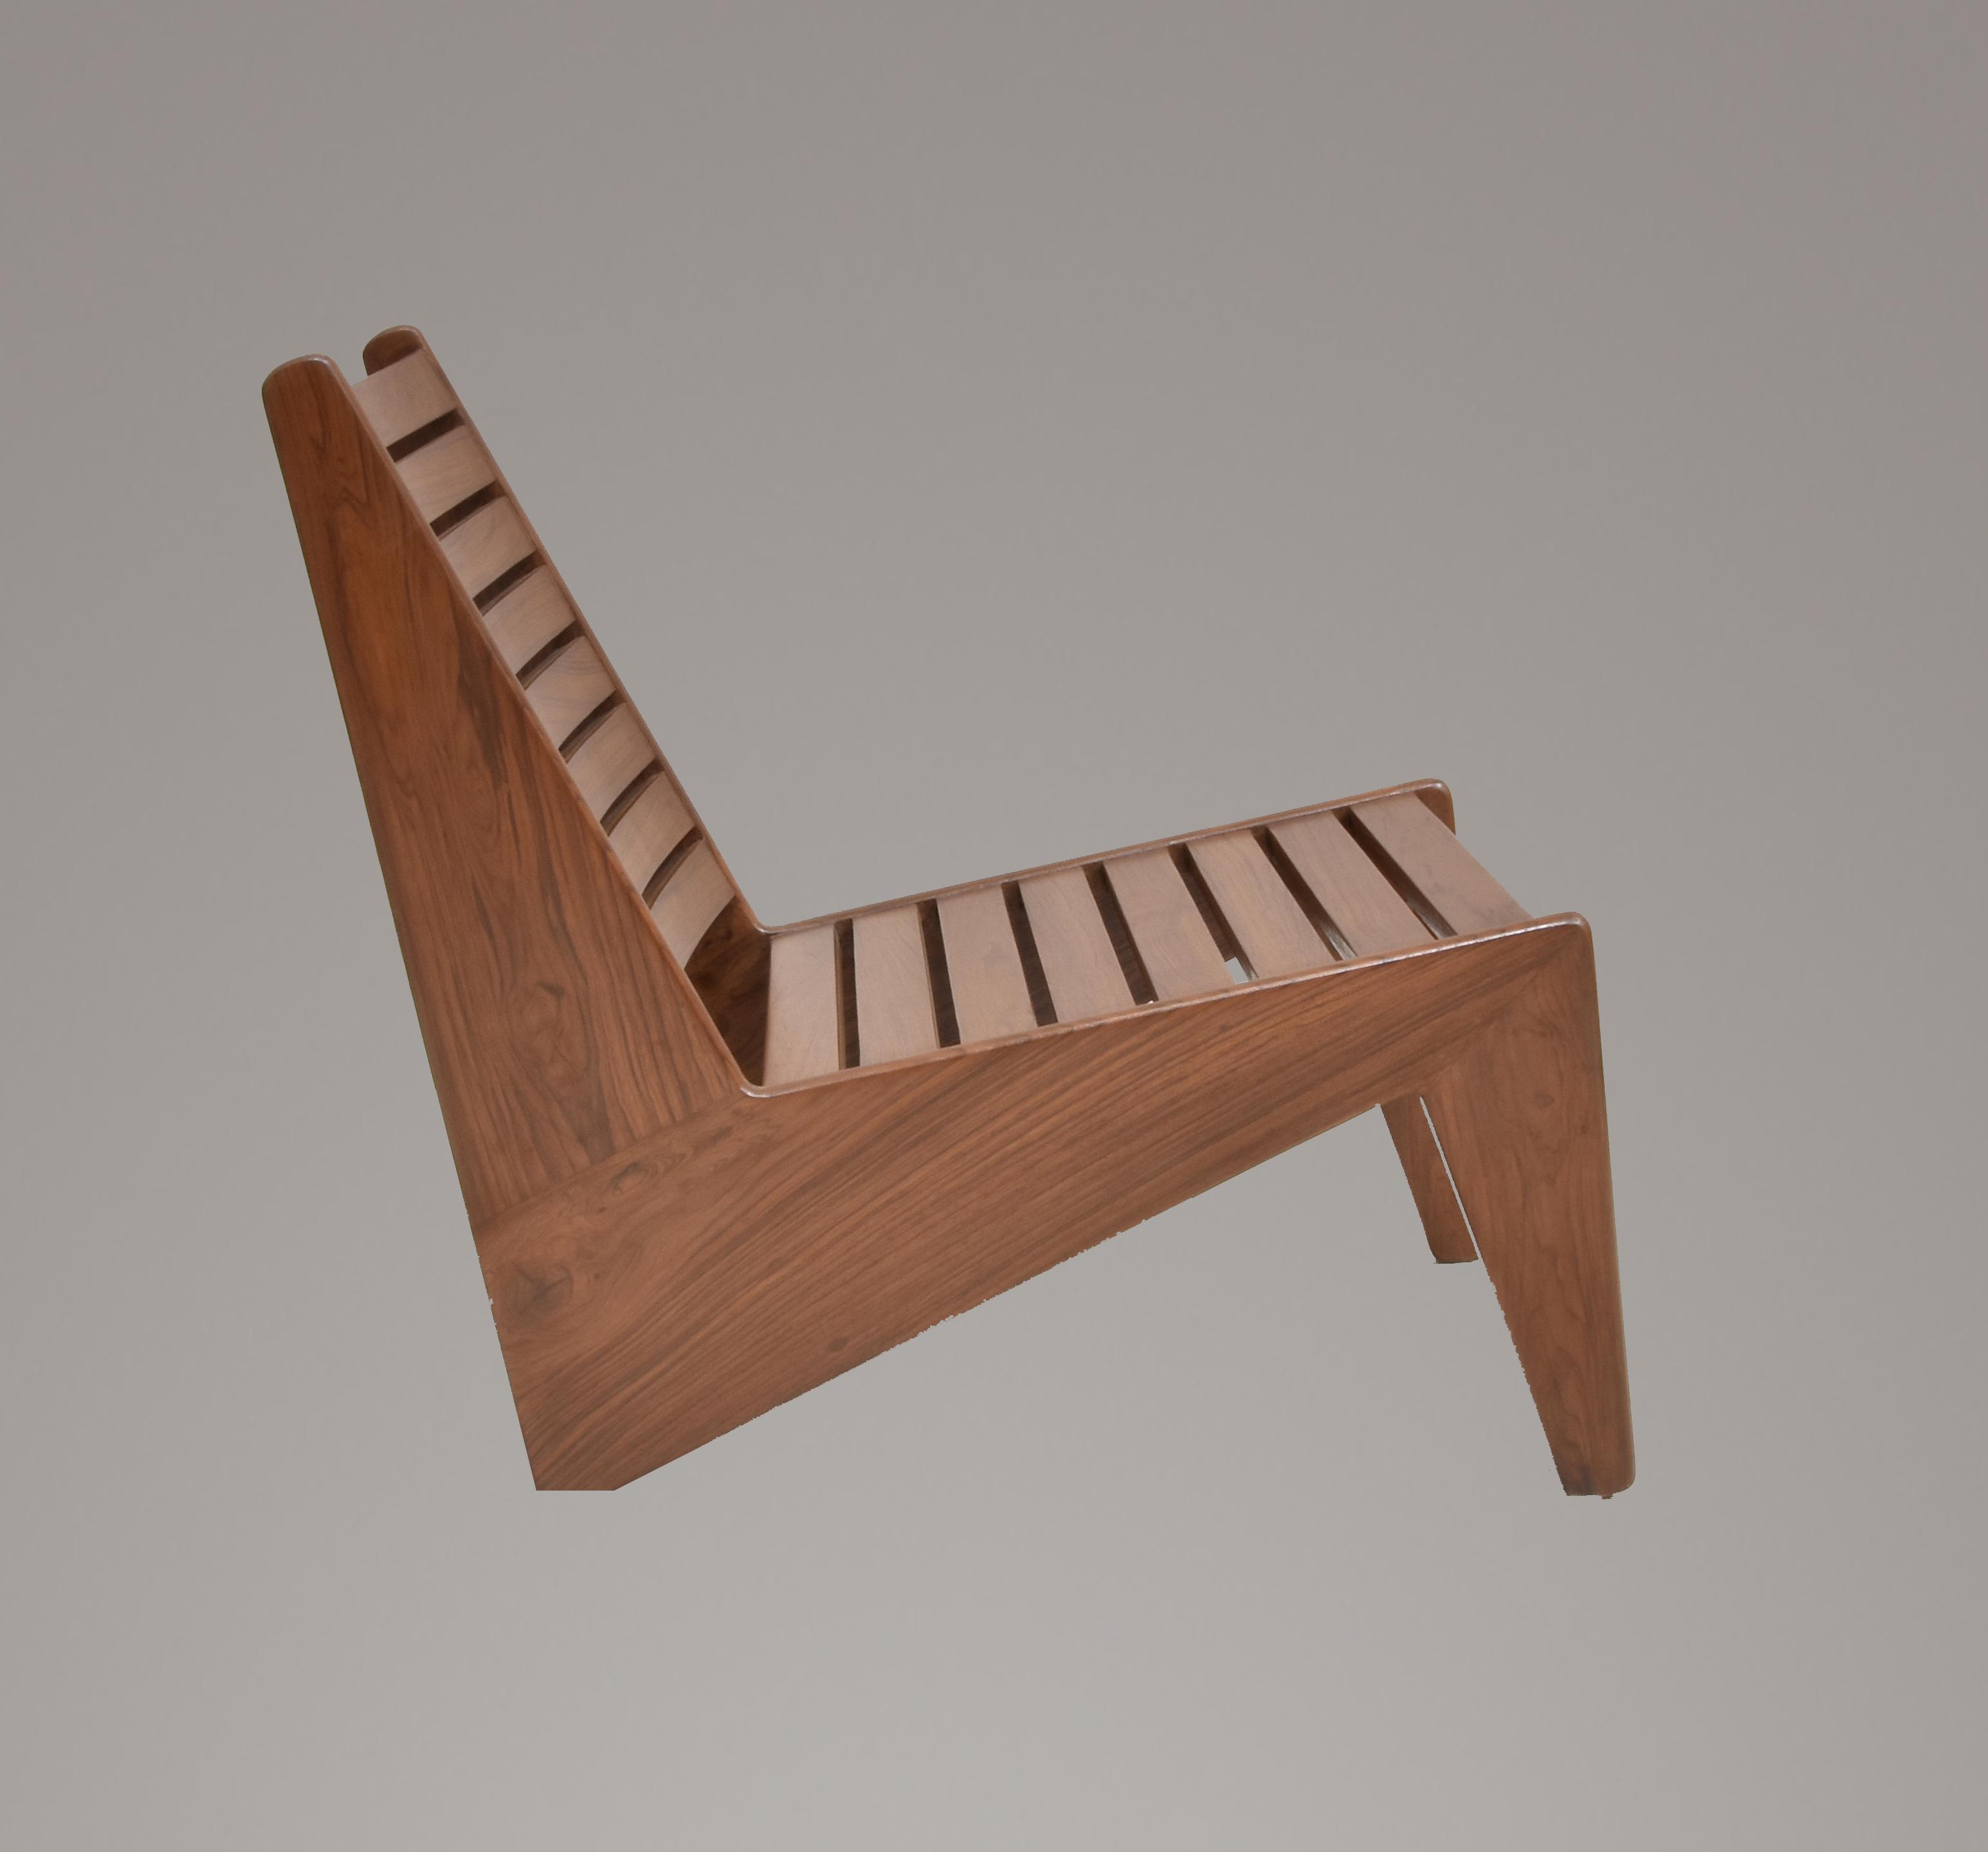 Pierre Jeanneret Outdoor Slatted Kangaroo Chair